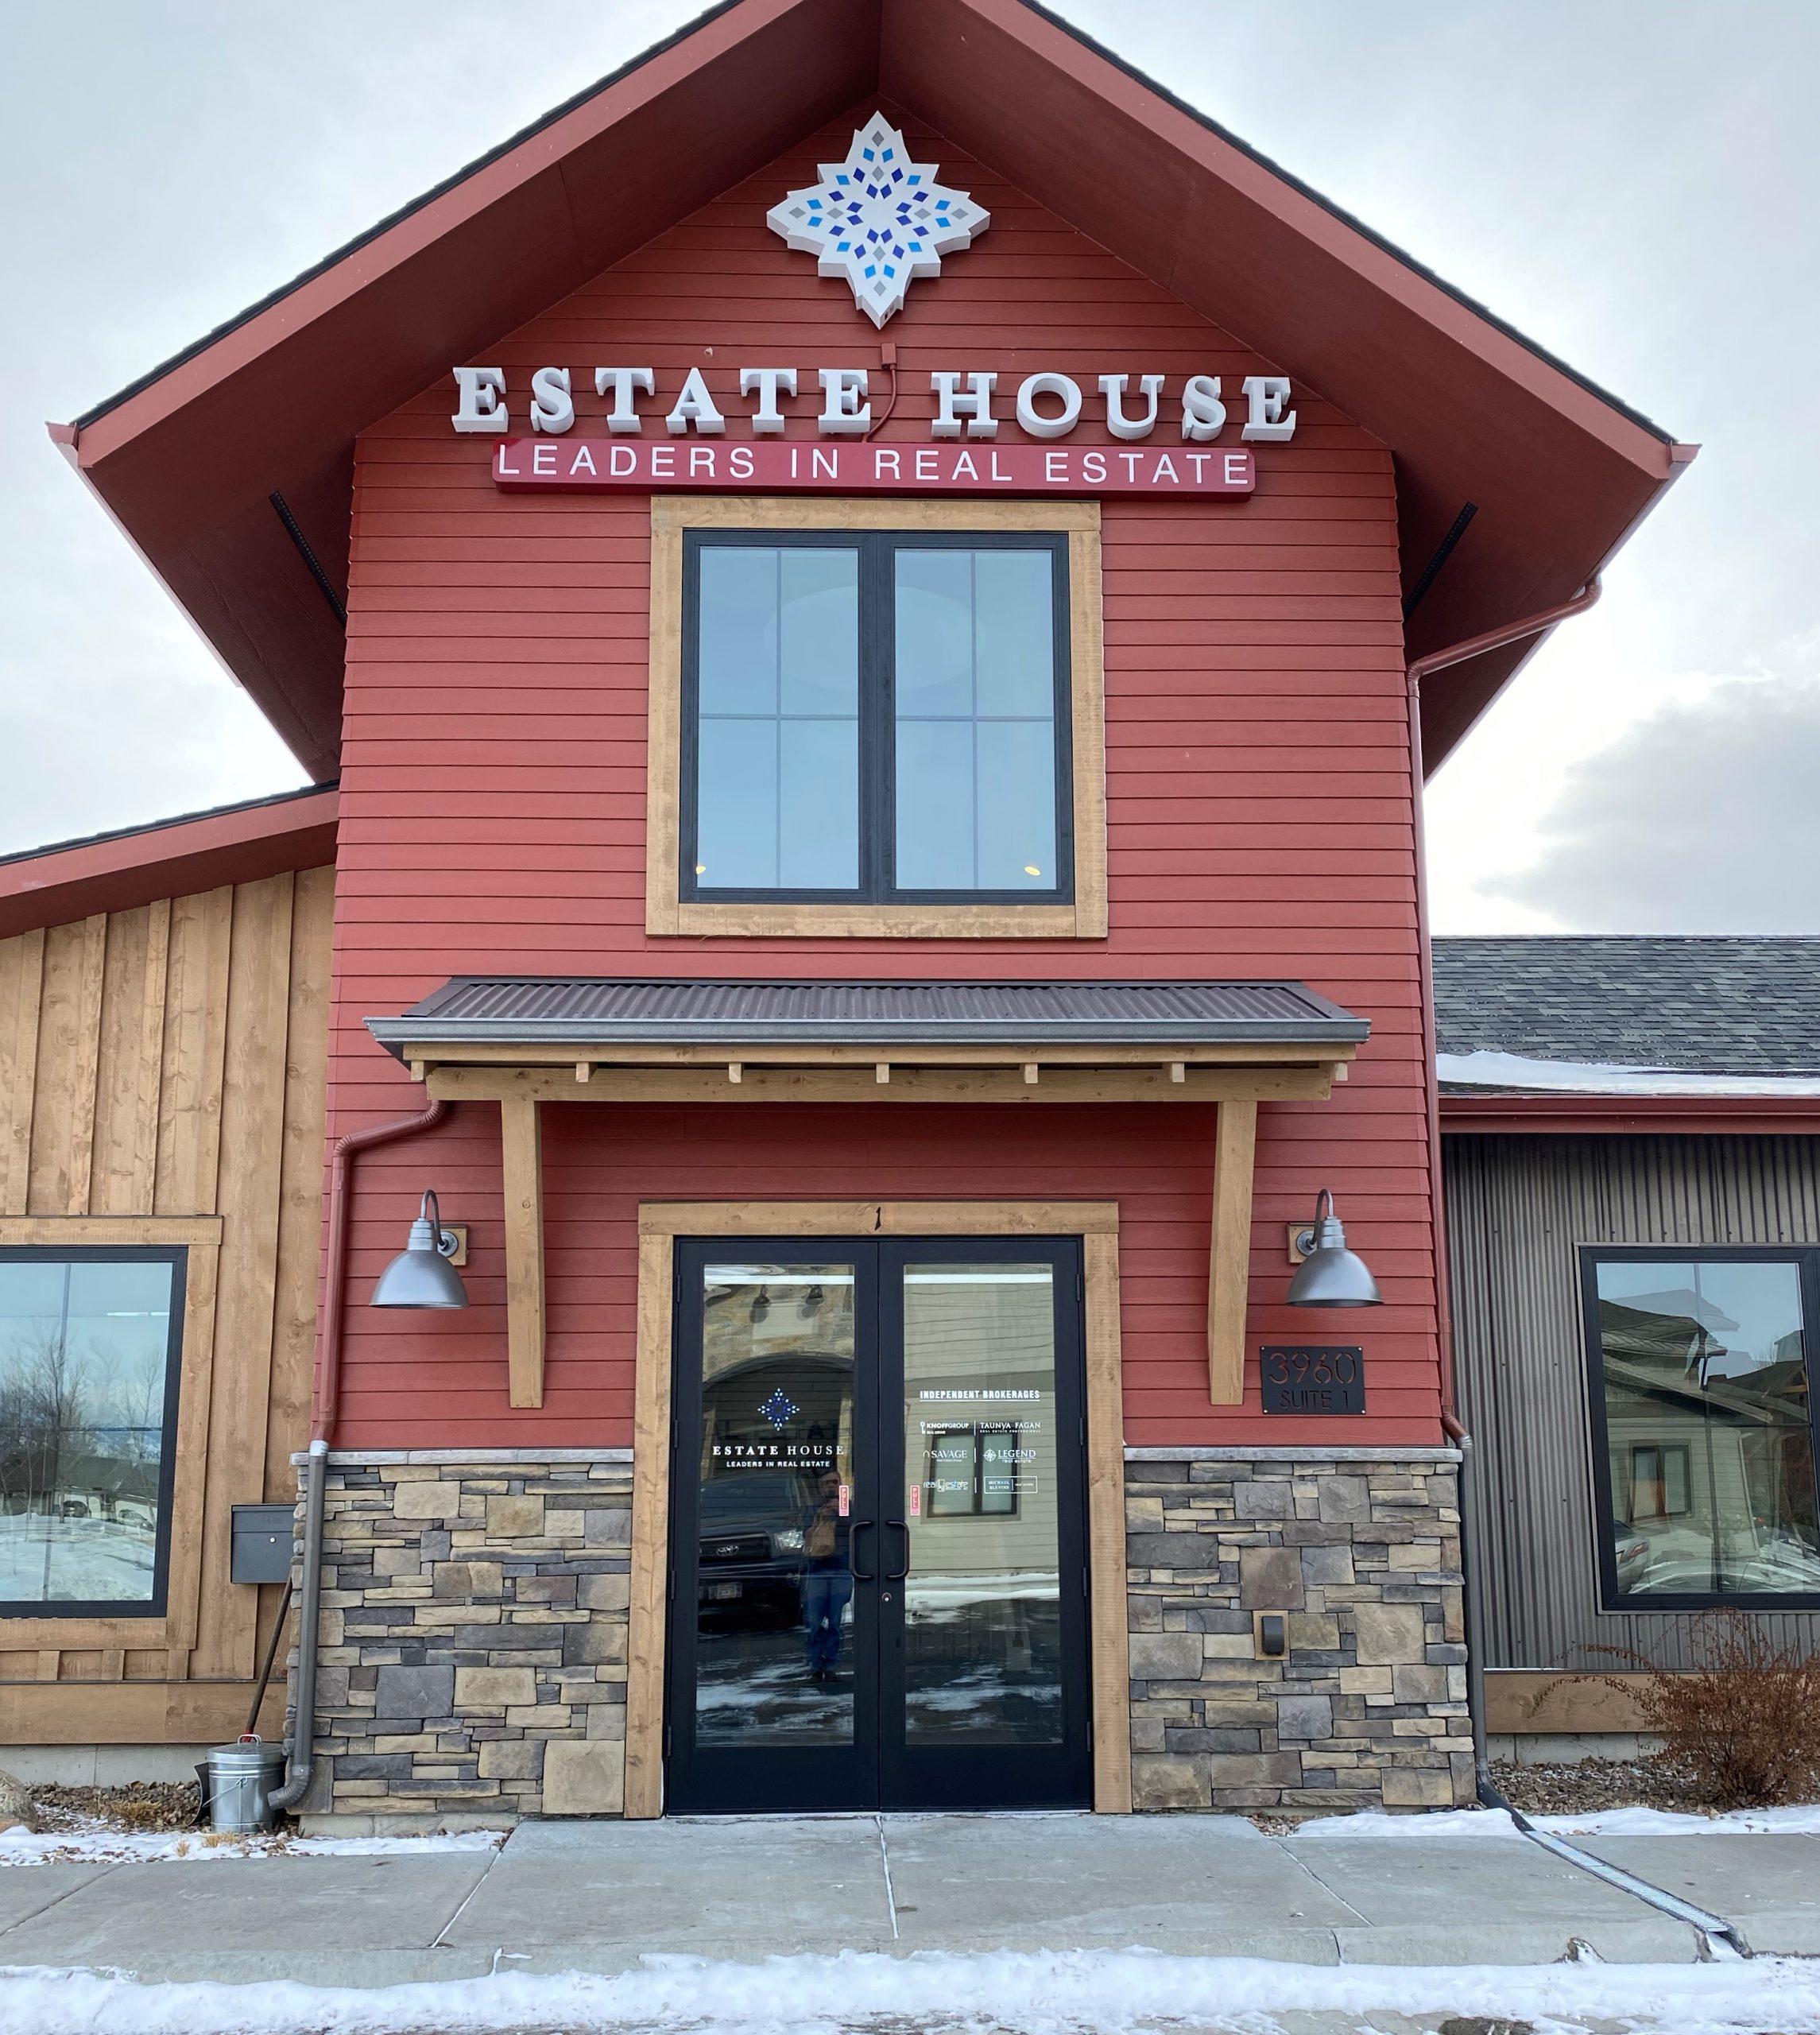 Taunya Fagan Bozeman Real Estate, 3960 Valley Commons Drive, Suite 1, Bozeman, MT 59718